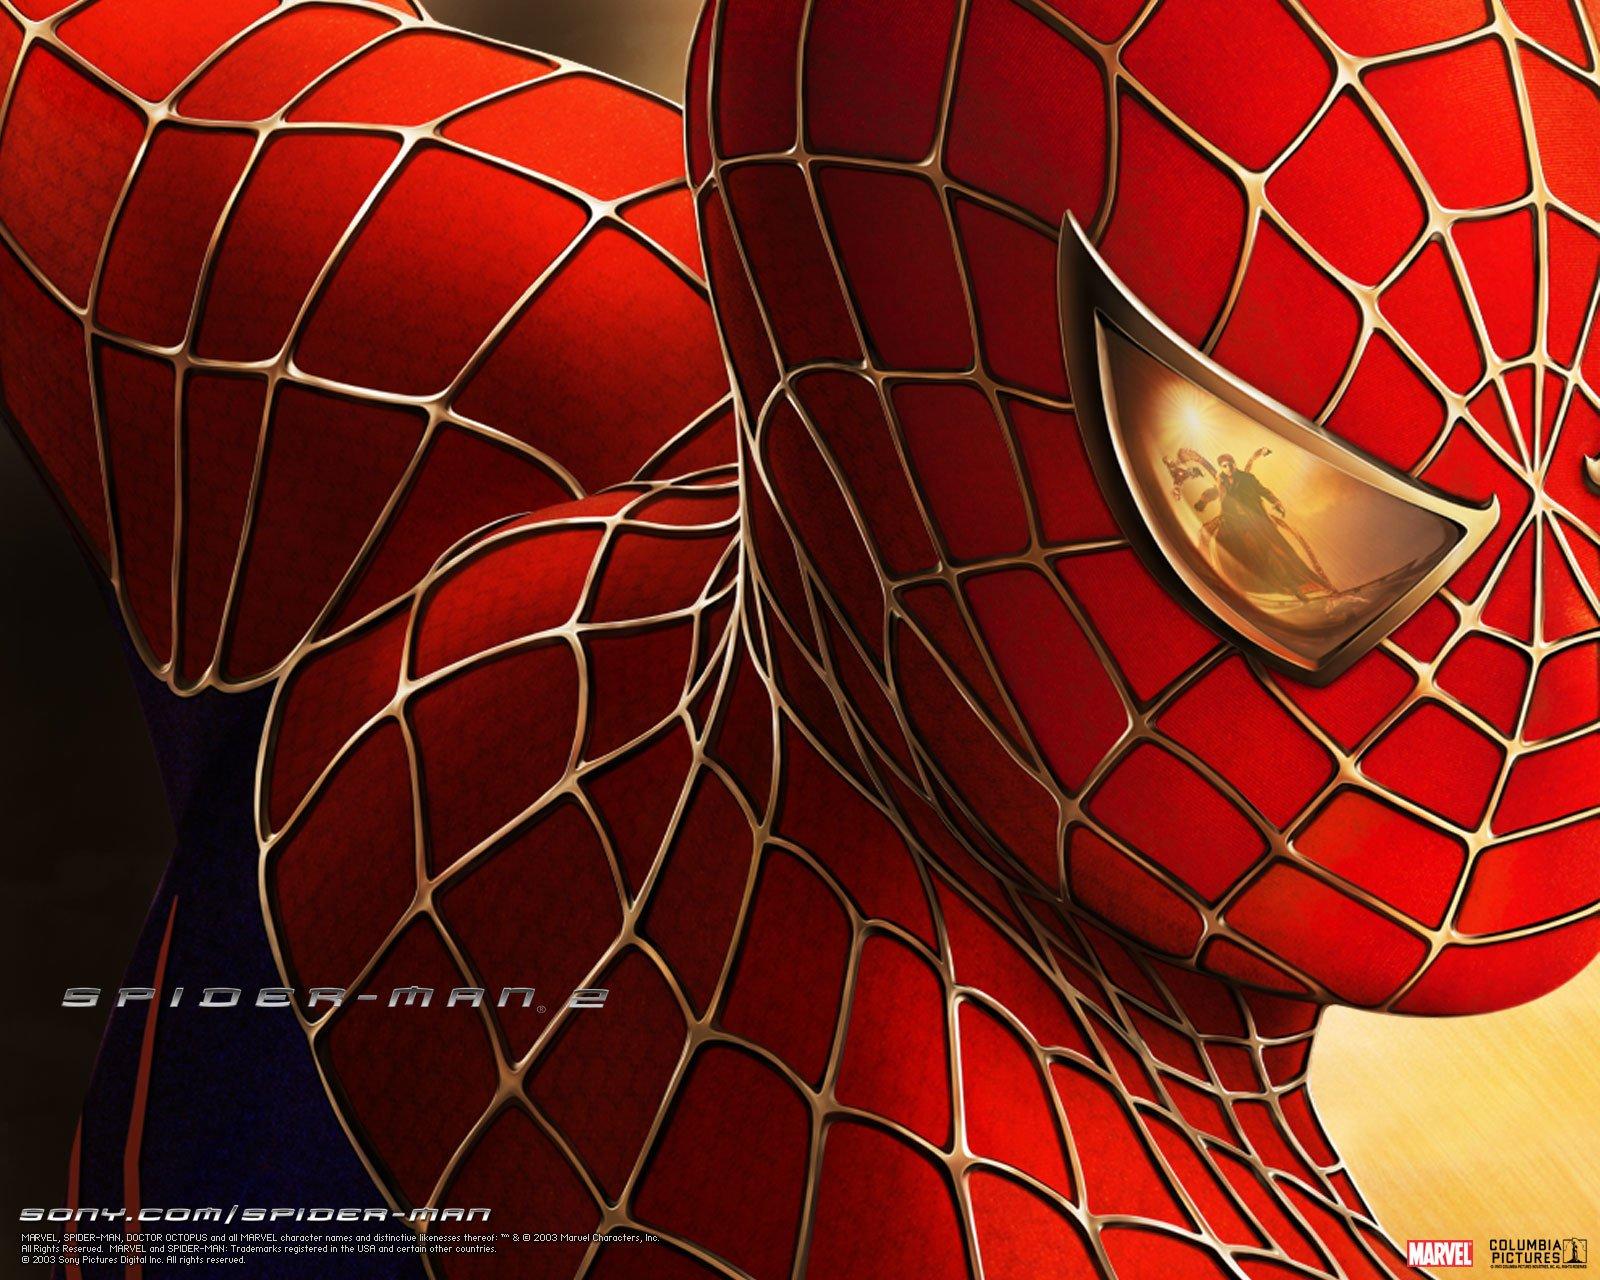 Spiderman Wallpaper Iphone X Spiderman 2 Fondo De Pantalla And Fondo De Escritorio